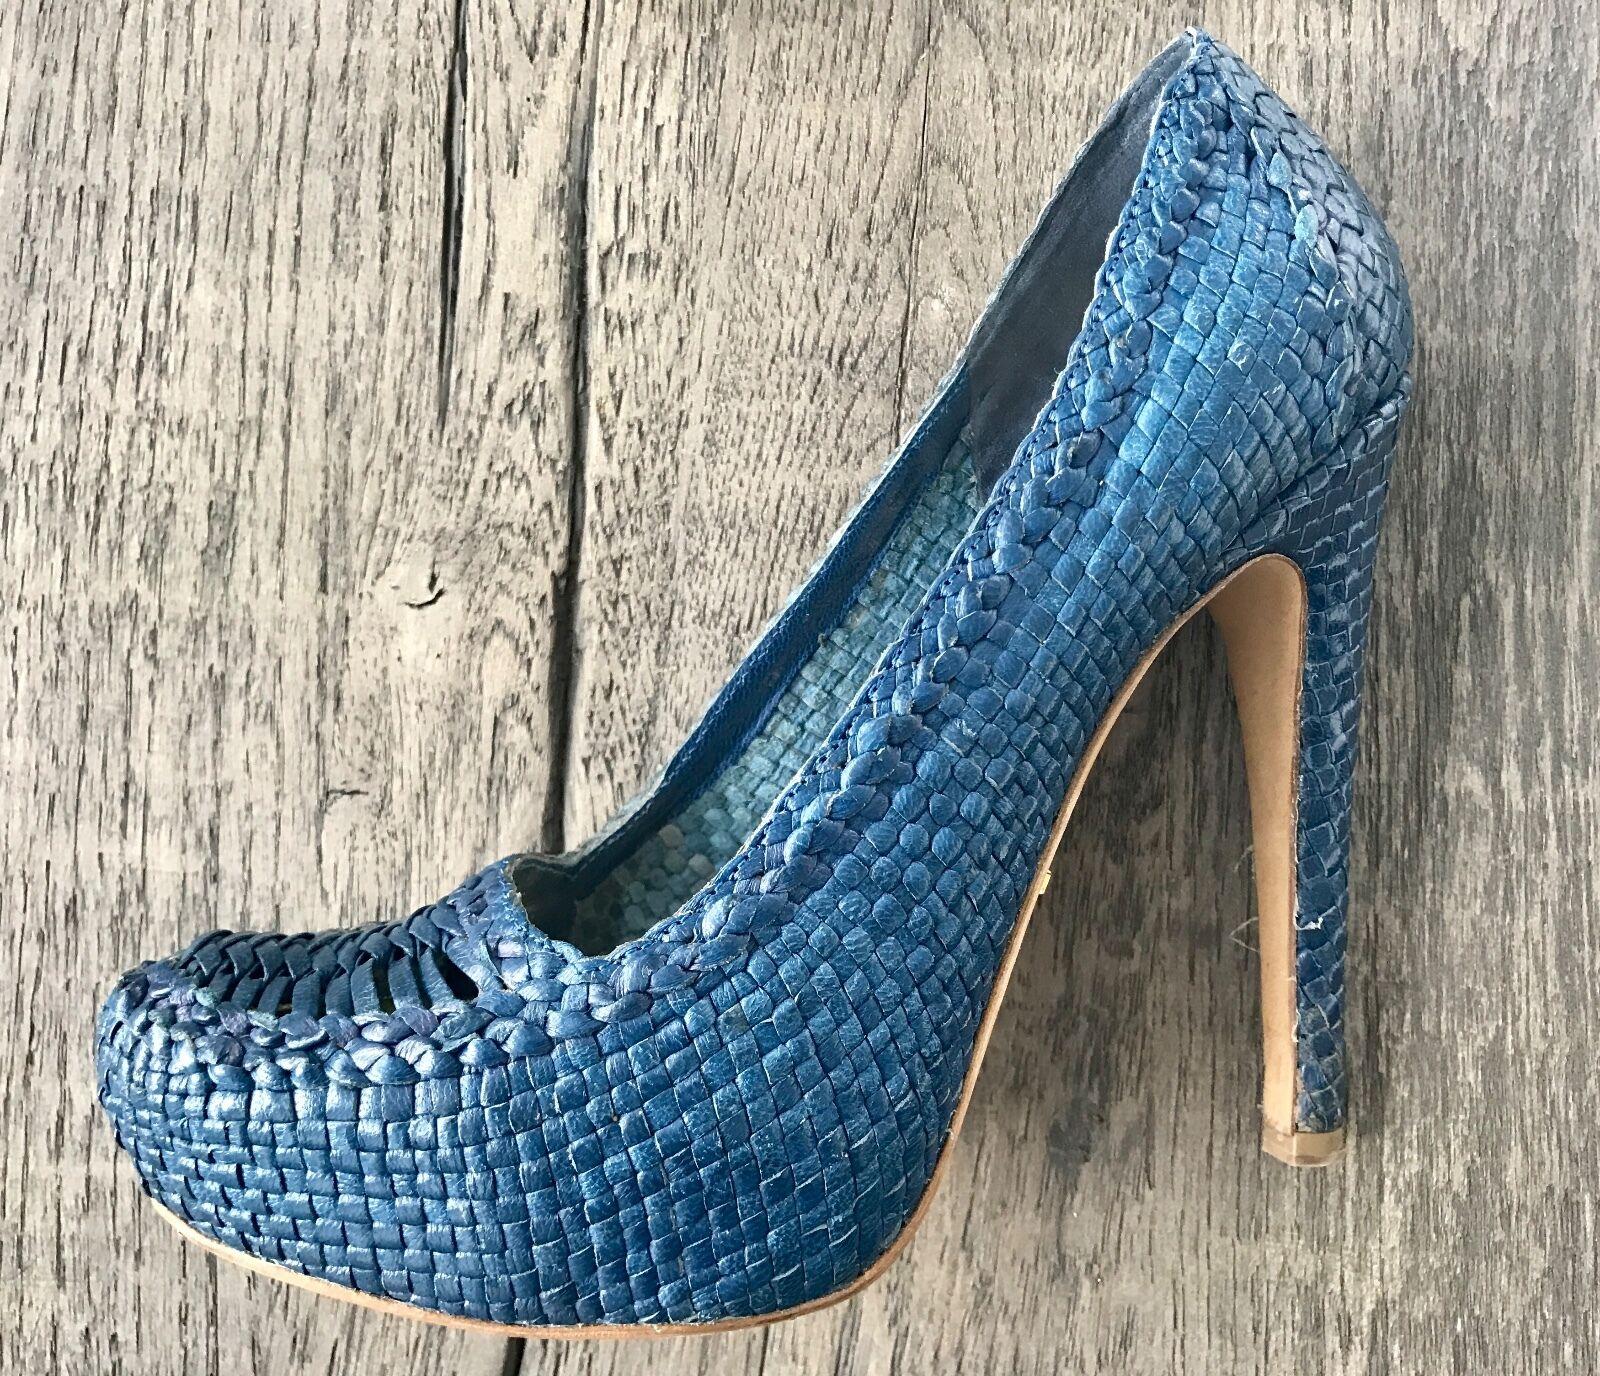 Prada woven leather blue platform size 38